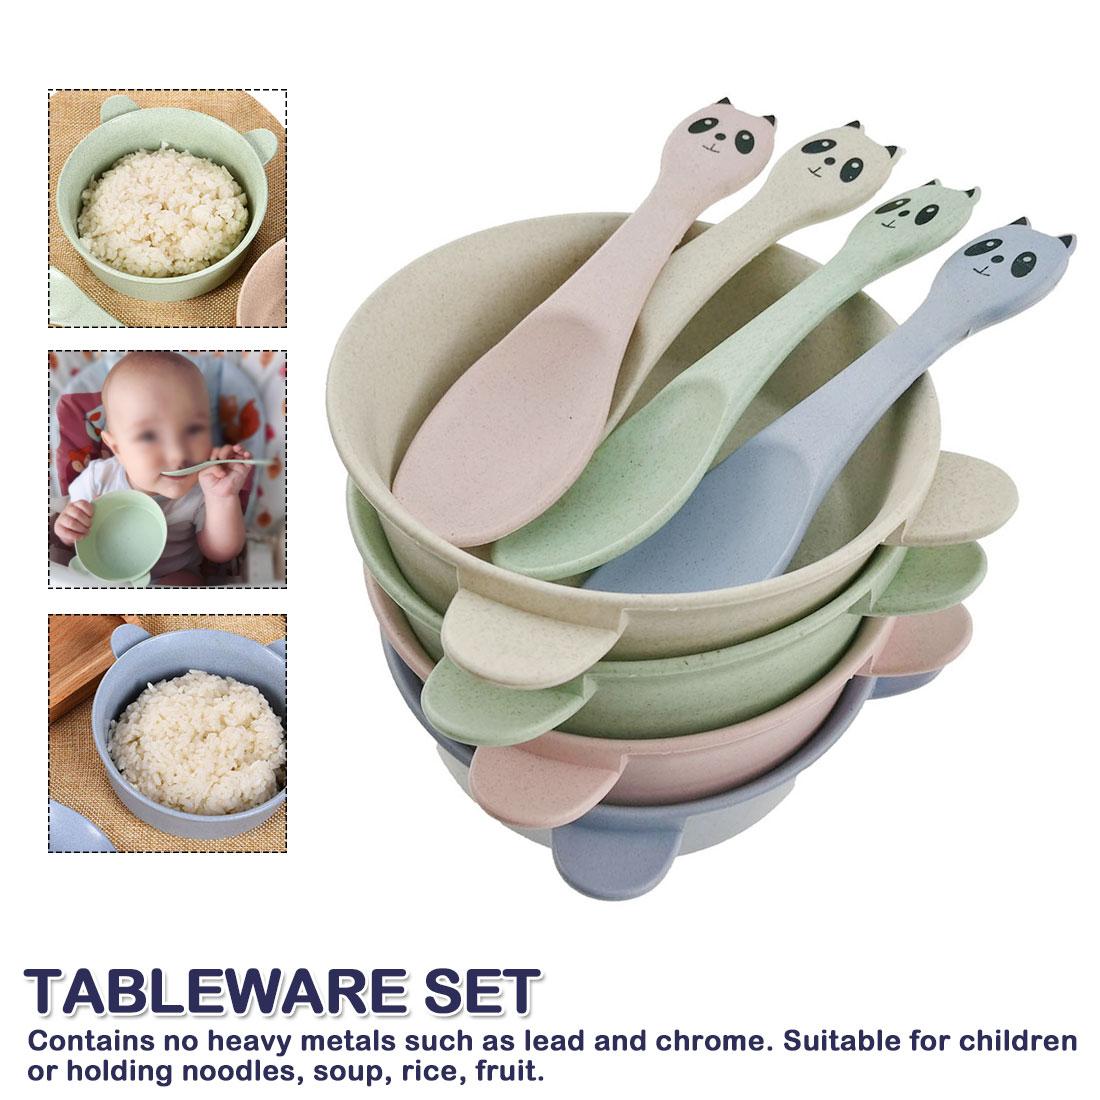 Cartoon Panda Bowl Spoon Wheat Straw Cutlery Set Baby Feeding Food Tableware Eco-Friendly Kids Training Tableware